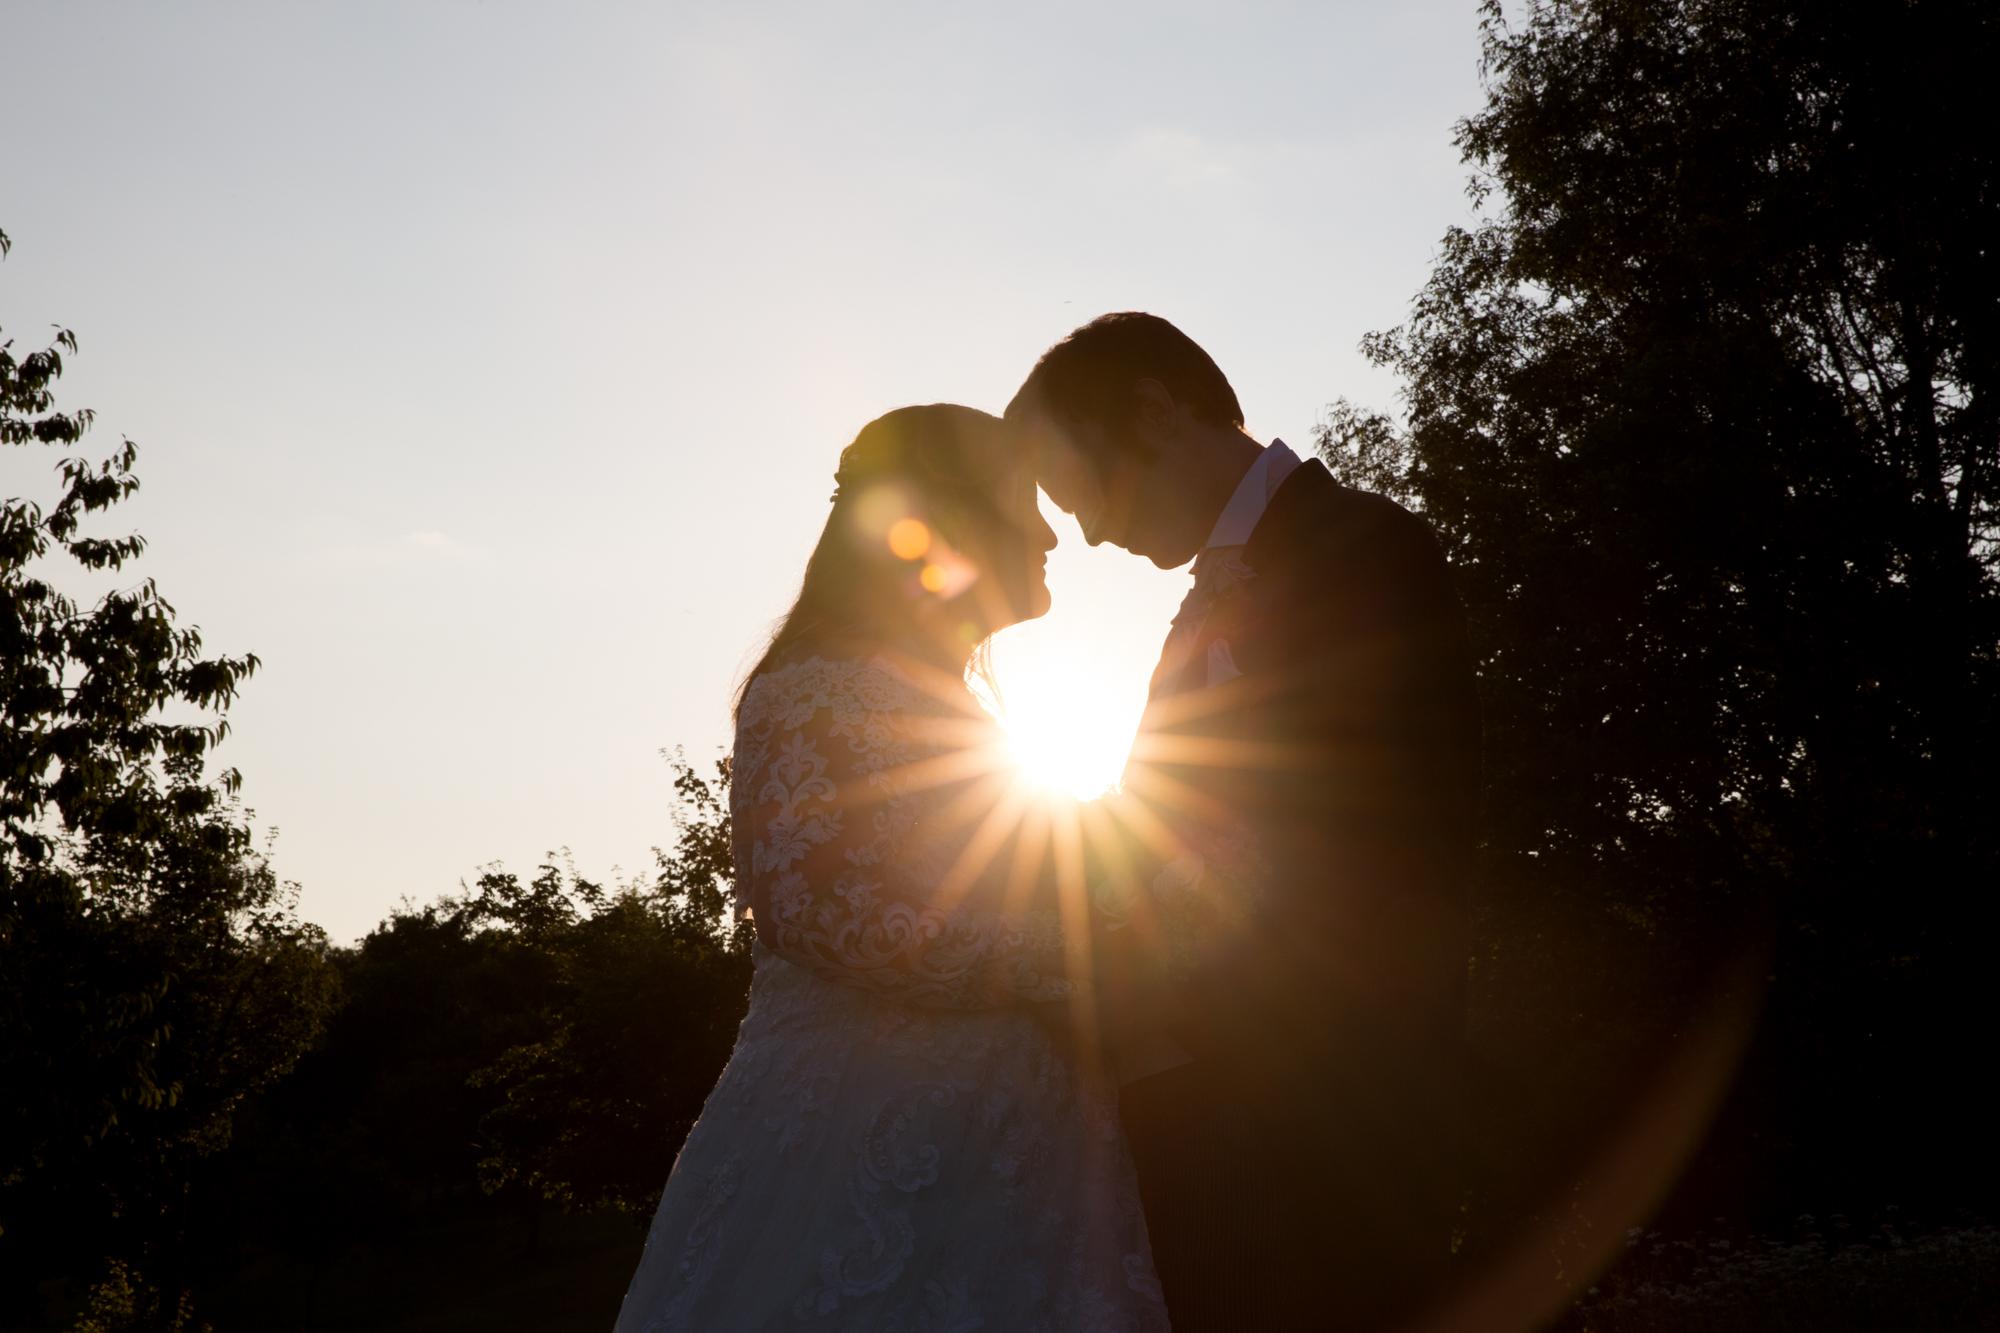 Sunset wedding couple portraits at Ridgeway Golf club, caerphilly mountain, thornhill